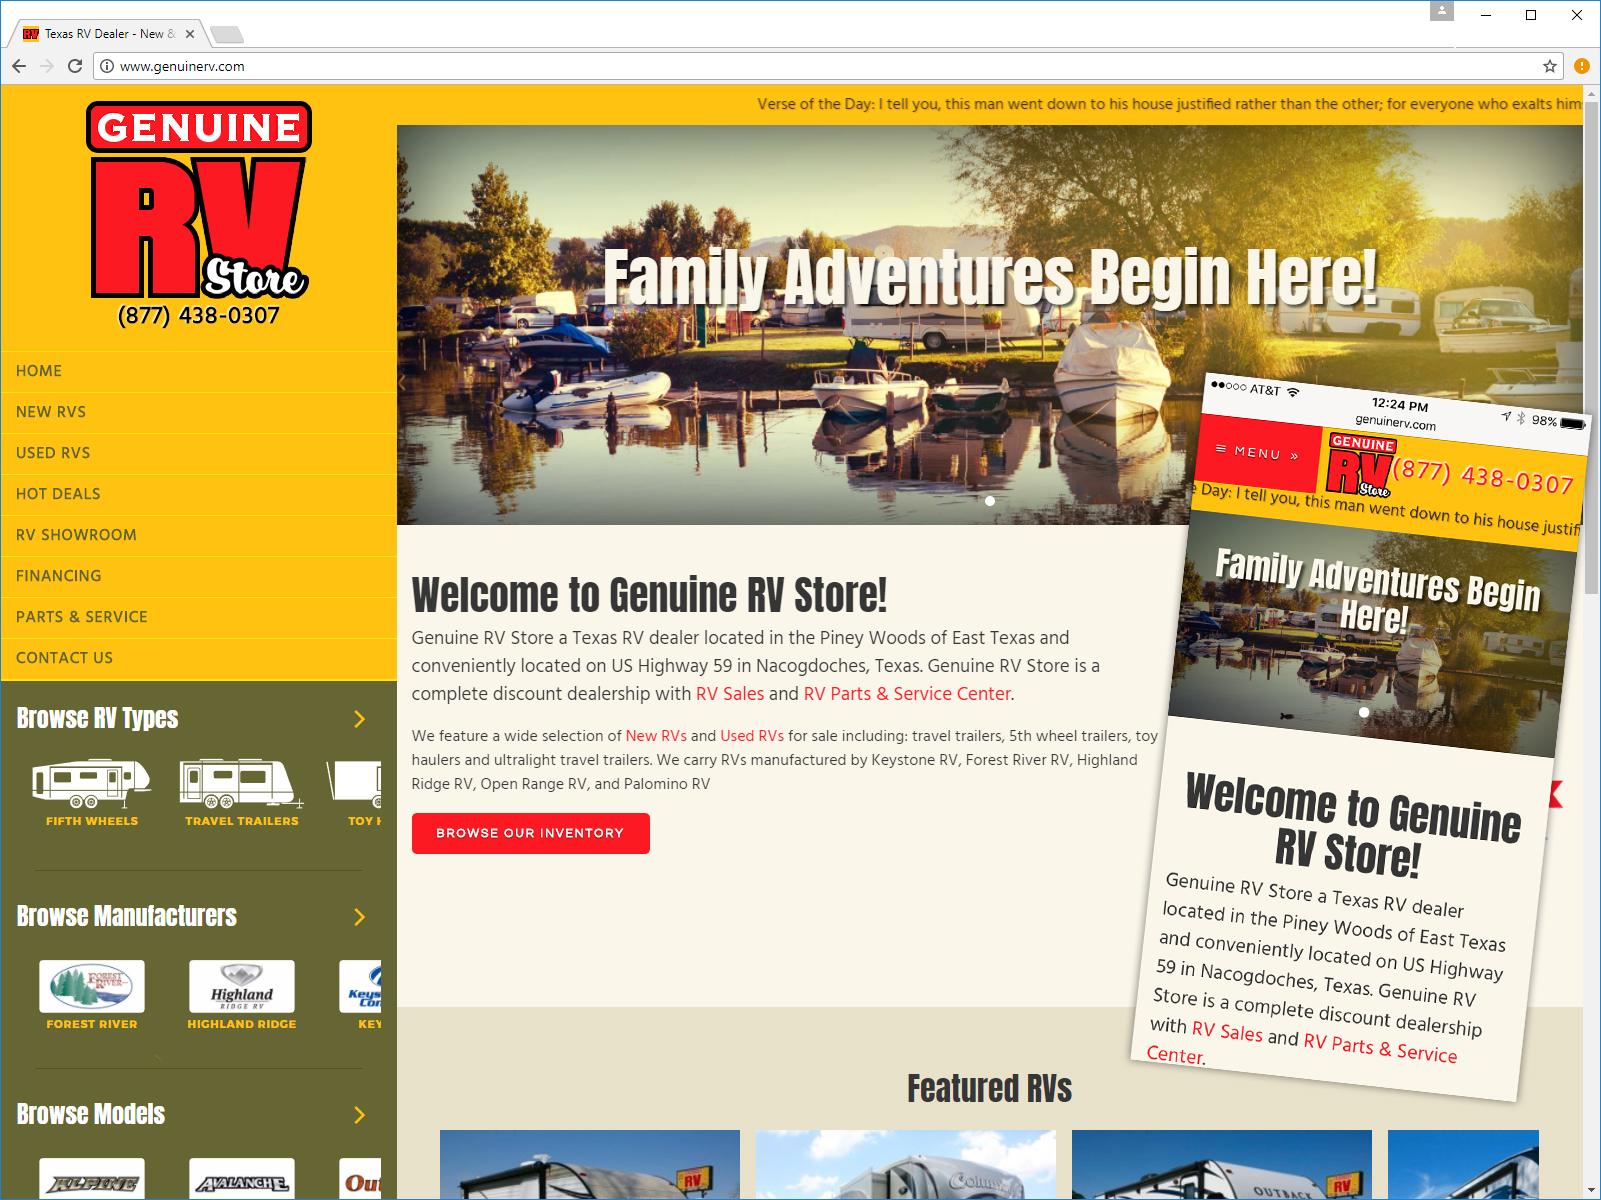 genuine website